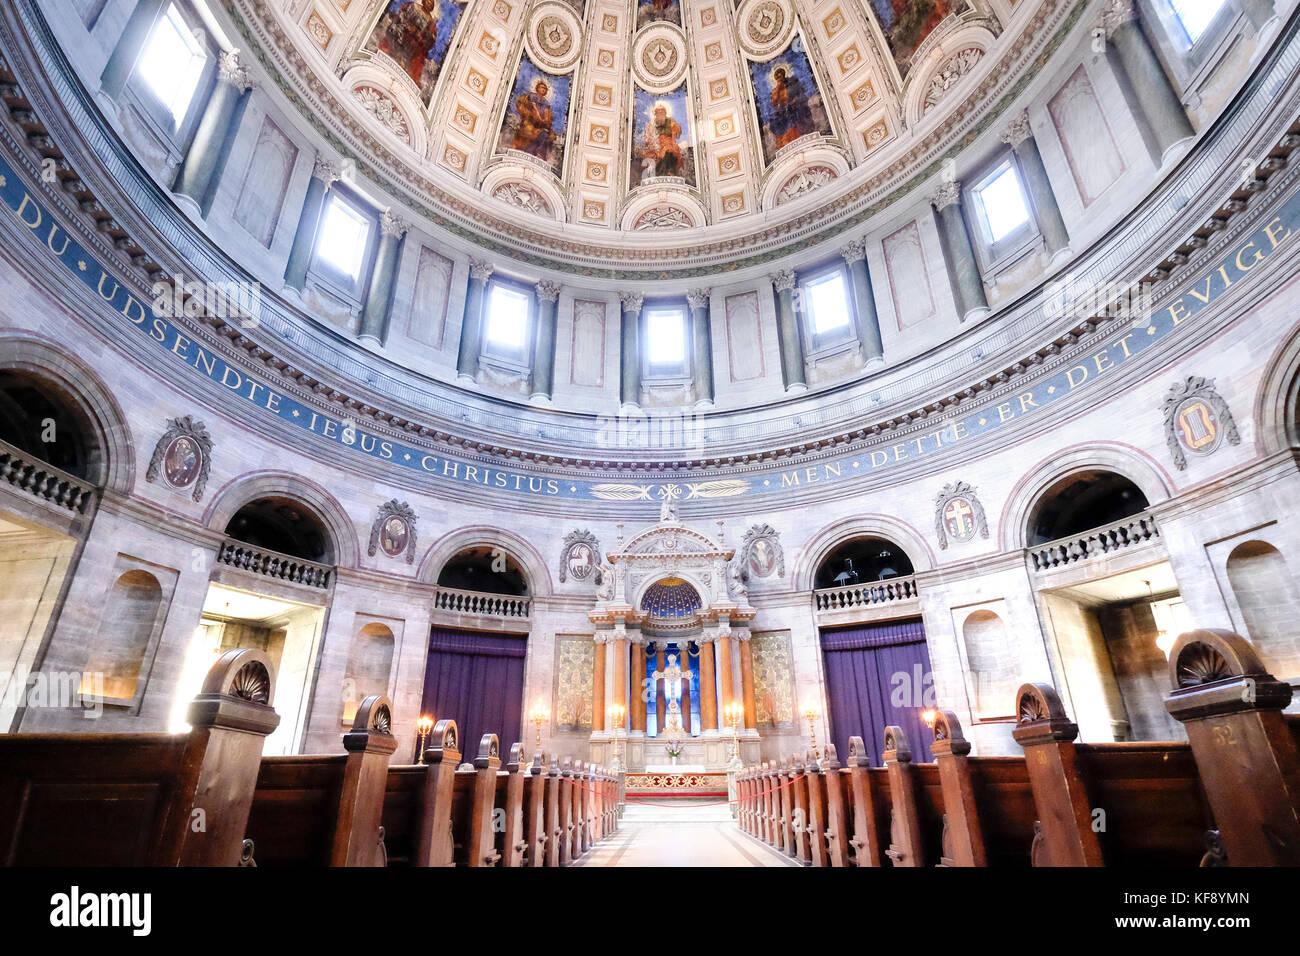 Denmark, Copenhagen, Marble Church - Stock Image